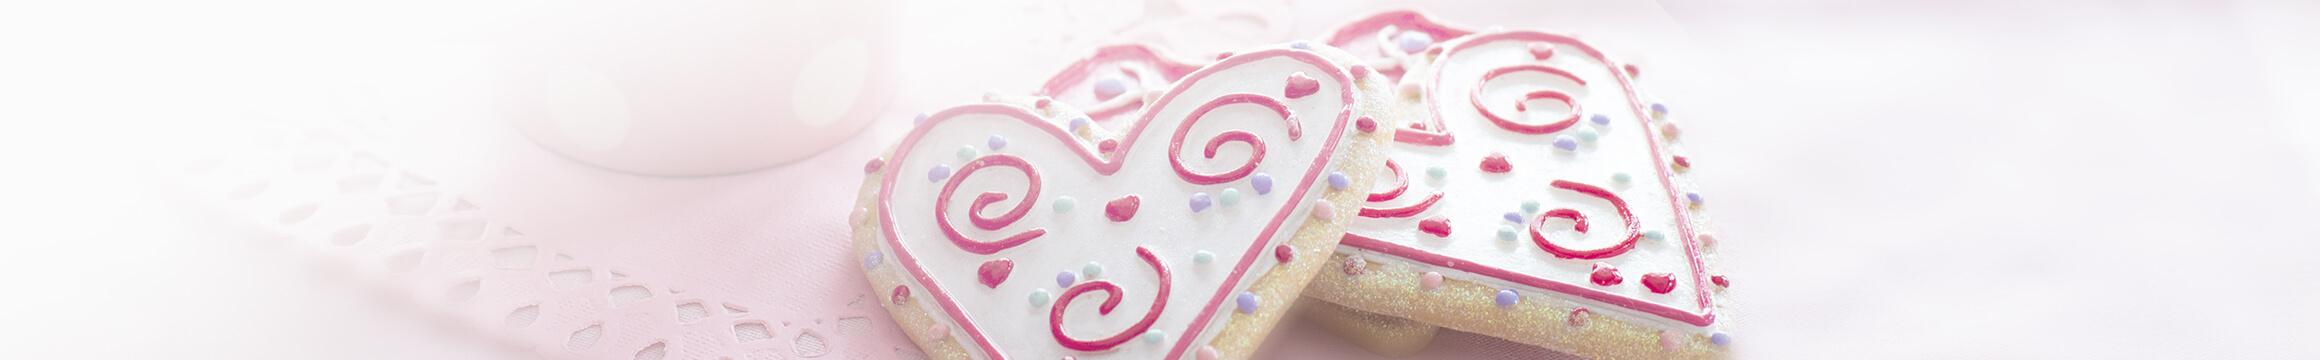 Hearts Love 20